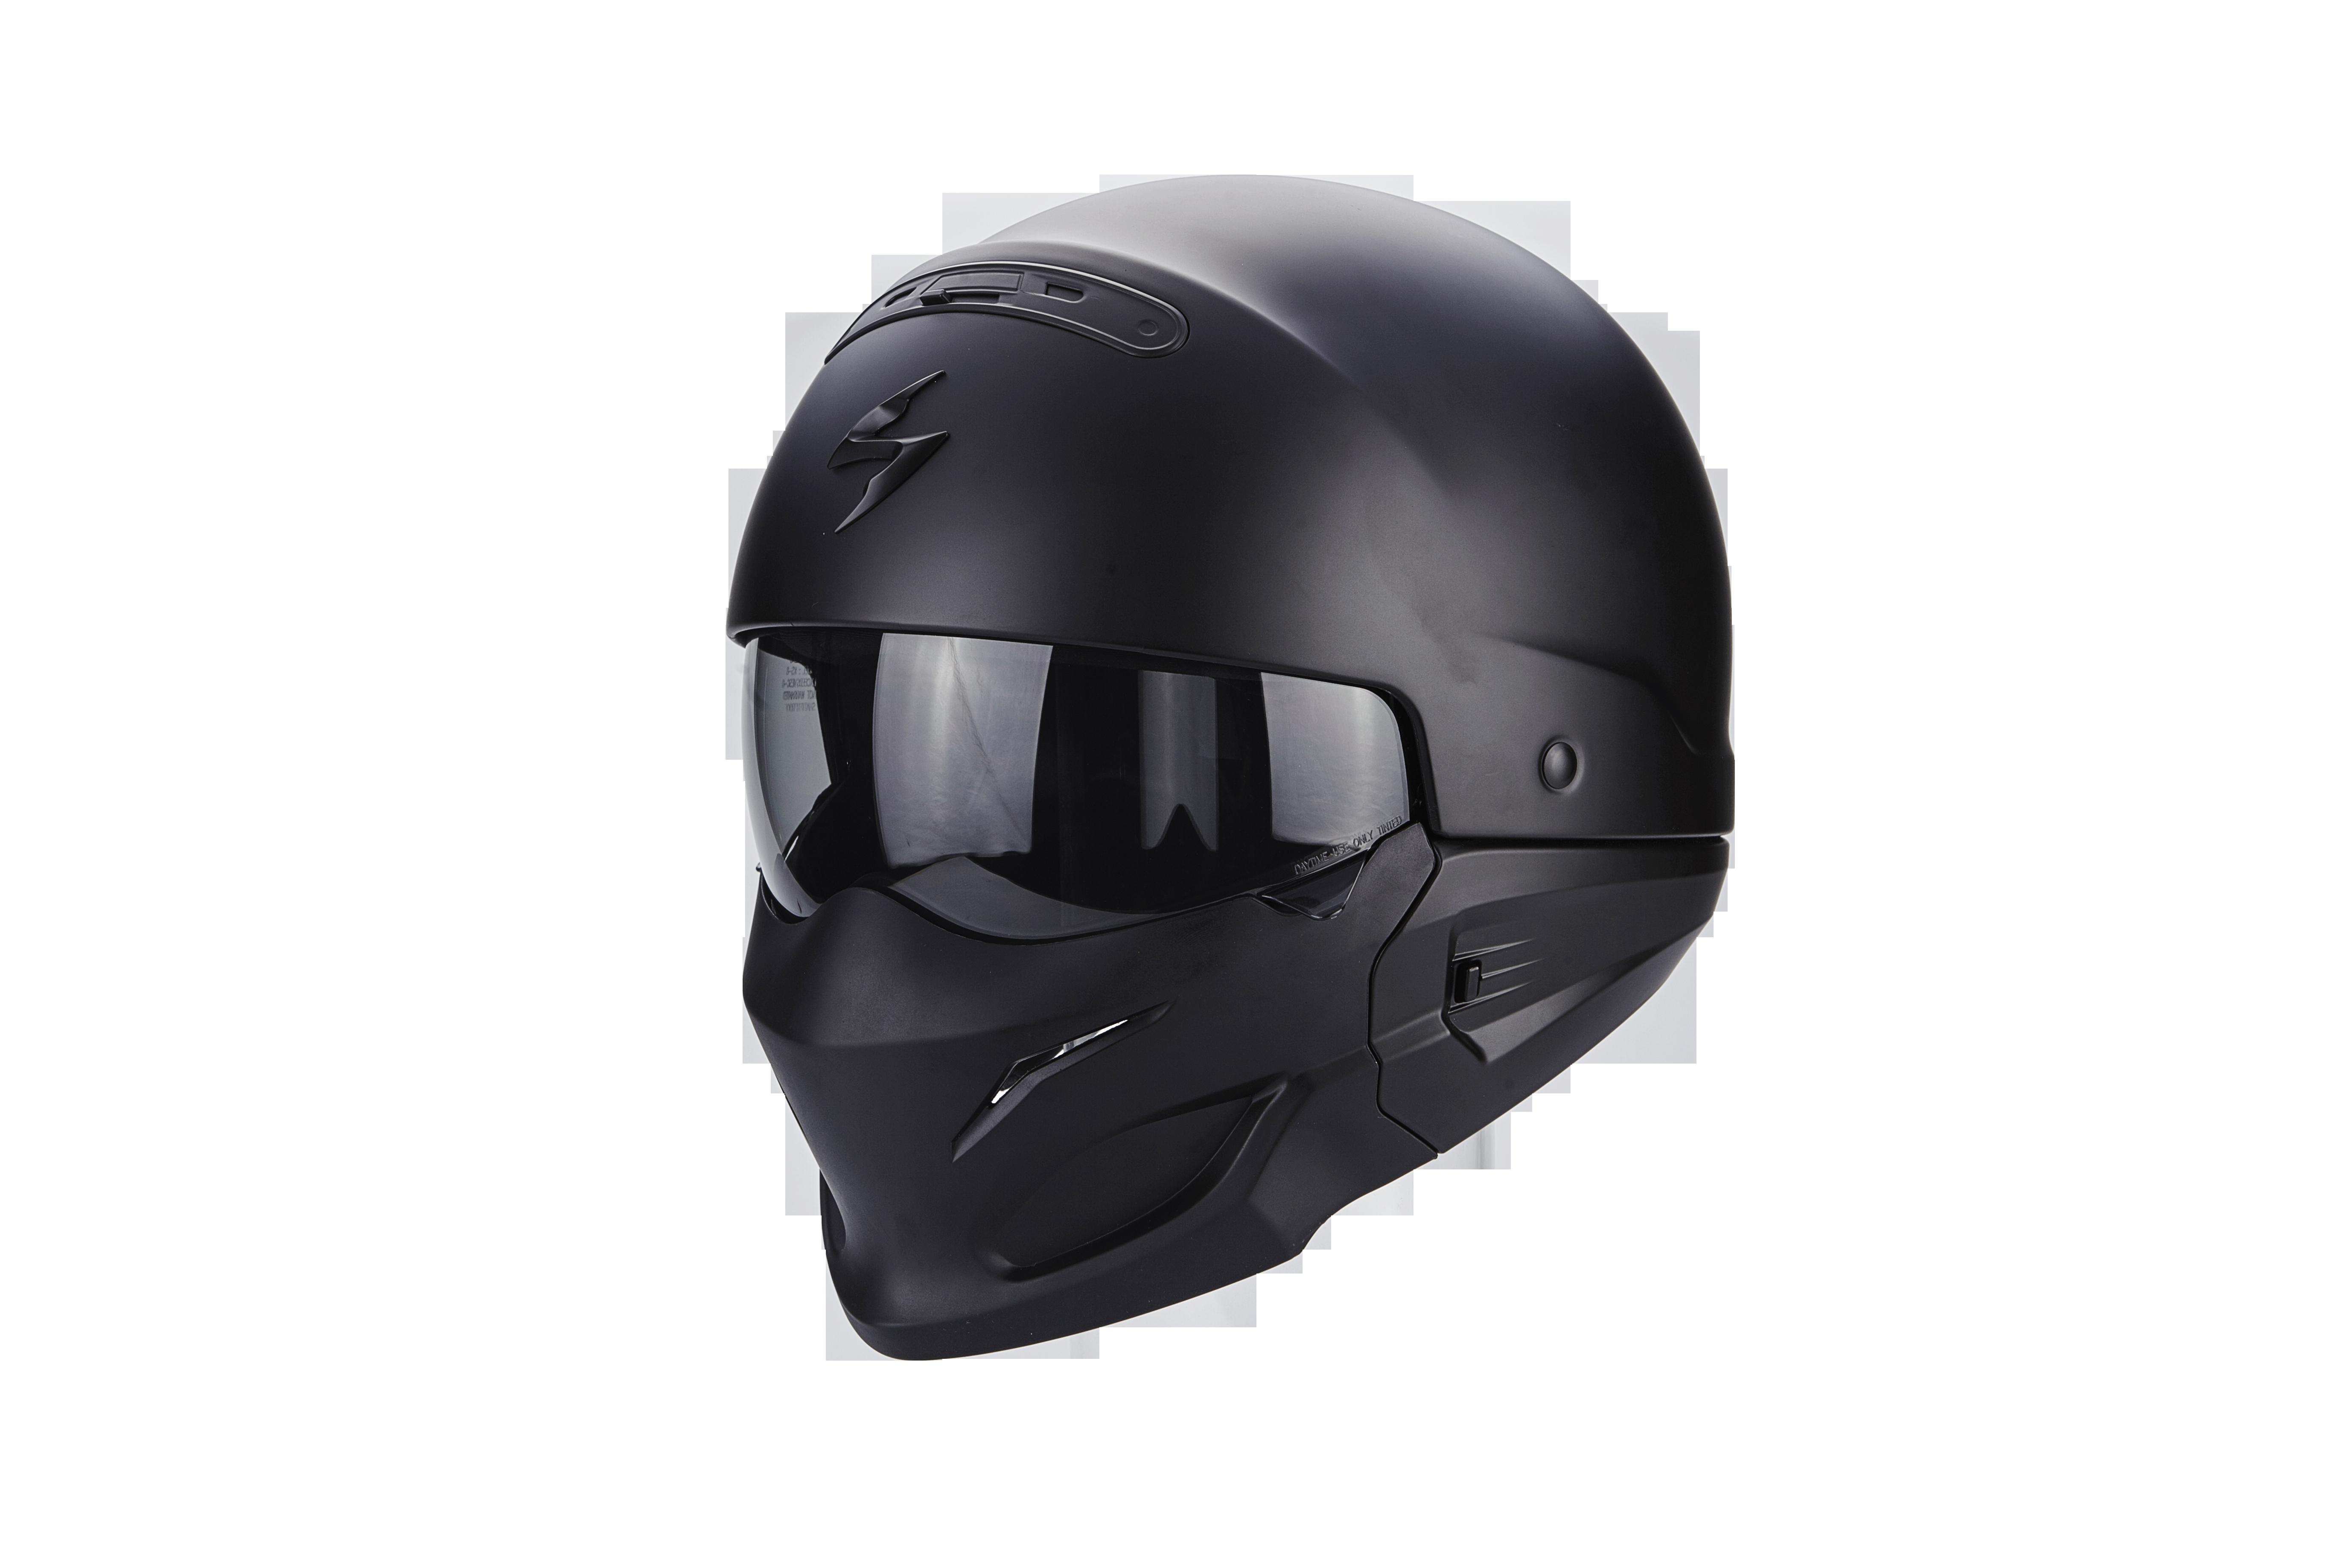 exo-combat-black-matt-2